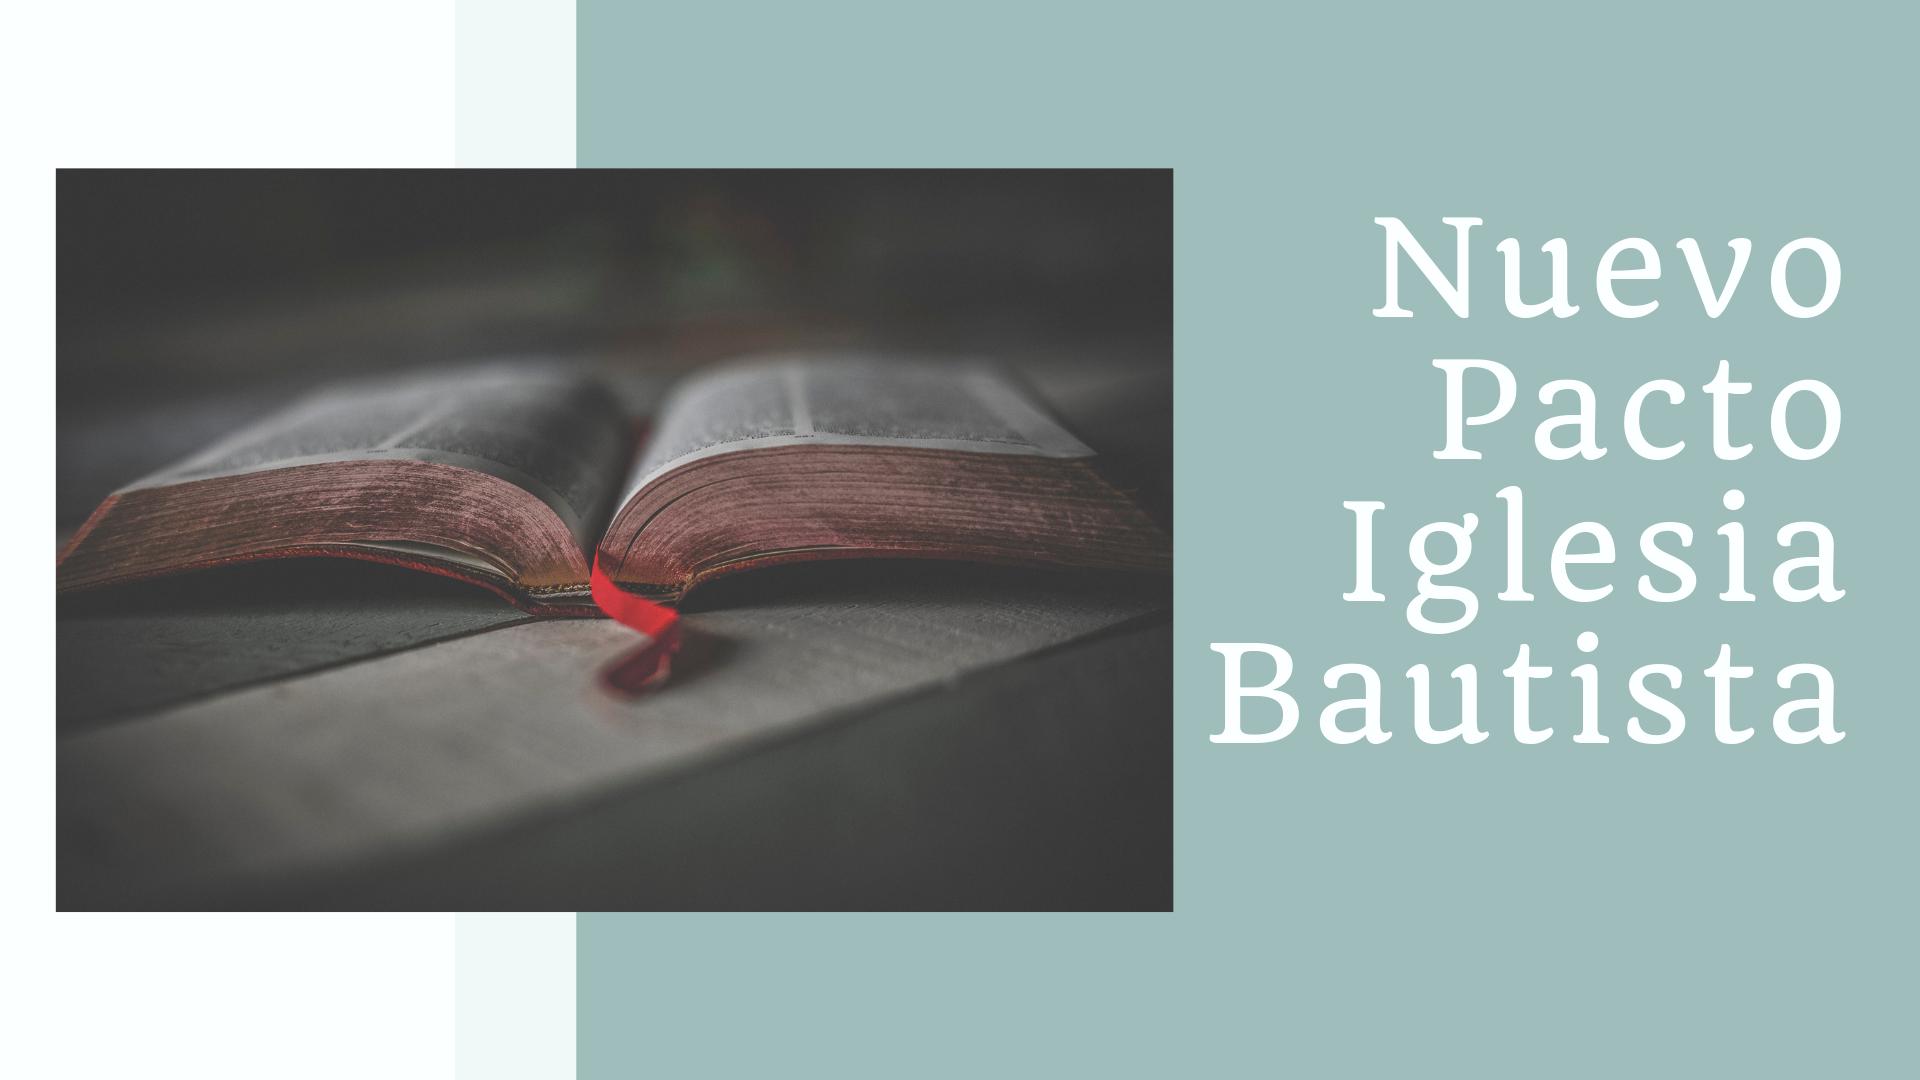 Nuevo Pacto Iglesia Bautista.png